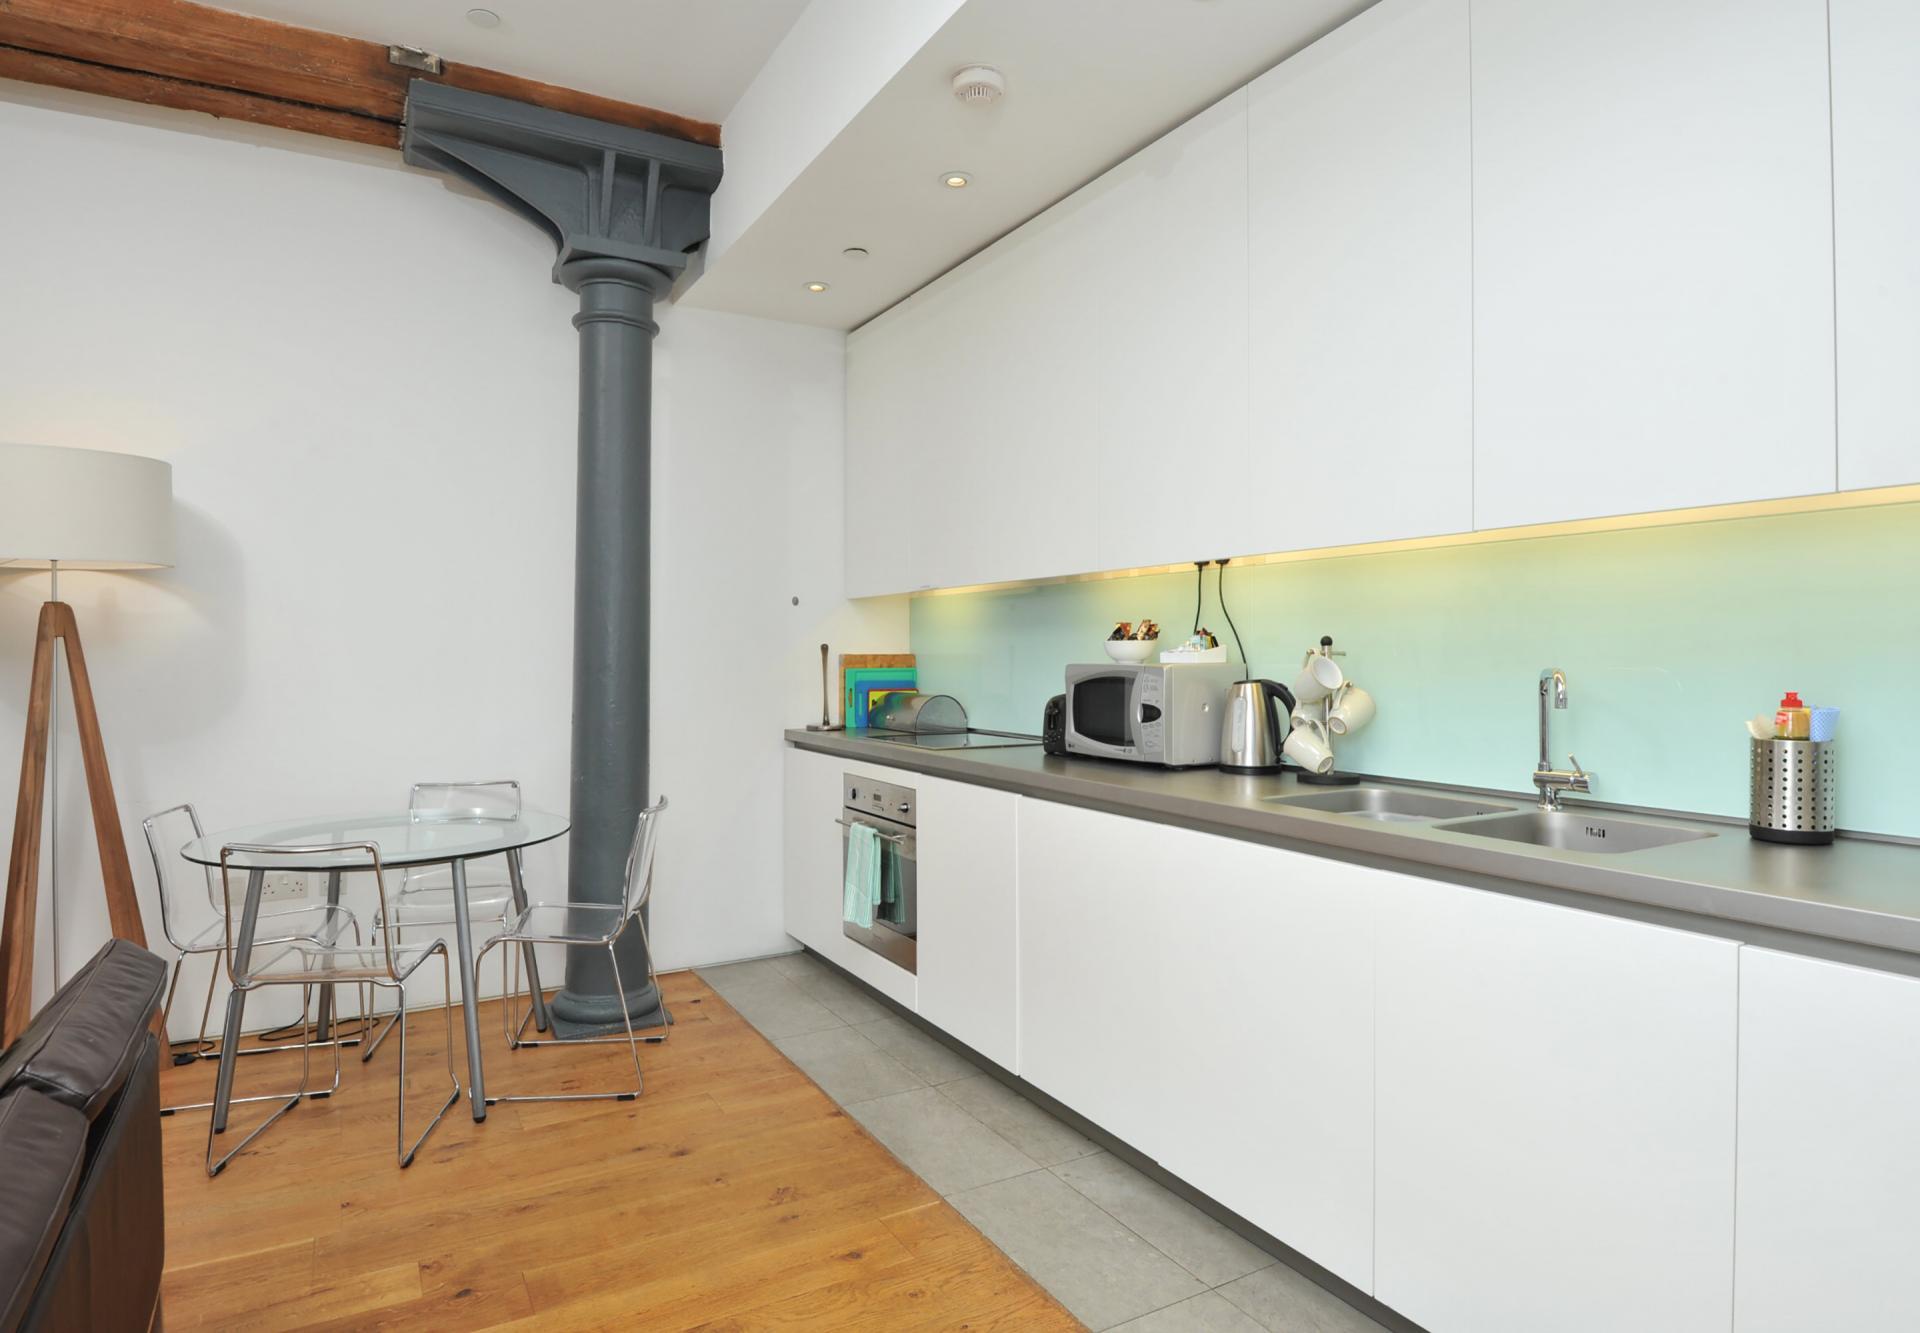 Appliances at Drakes Wharf Apartments